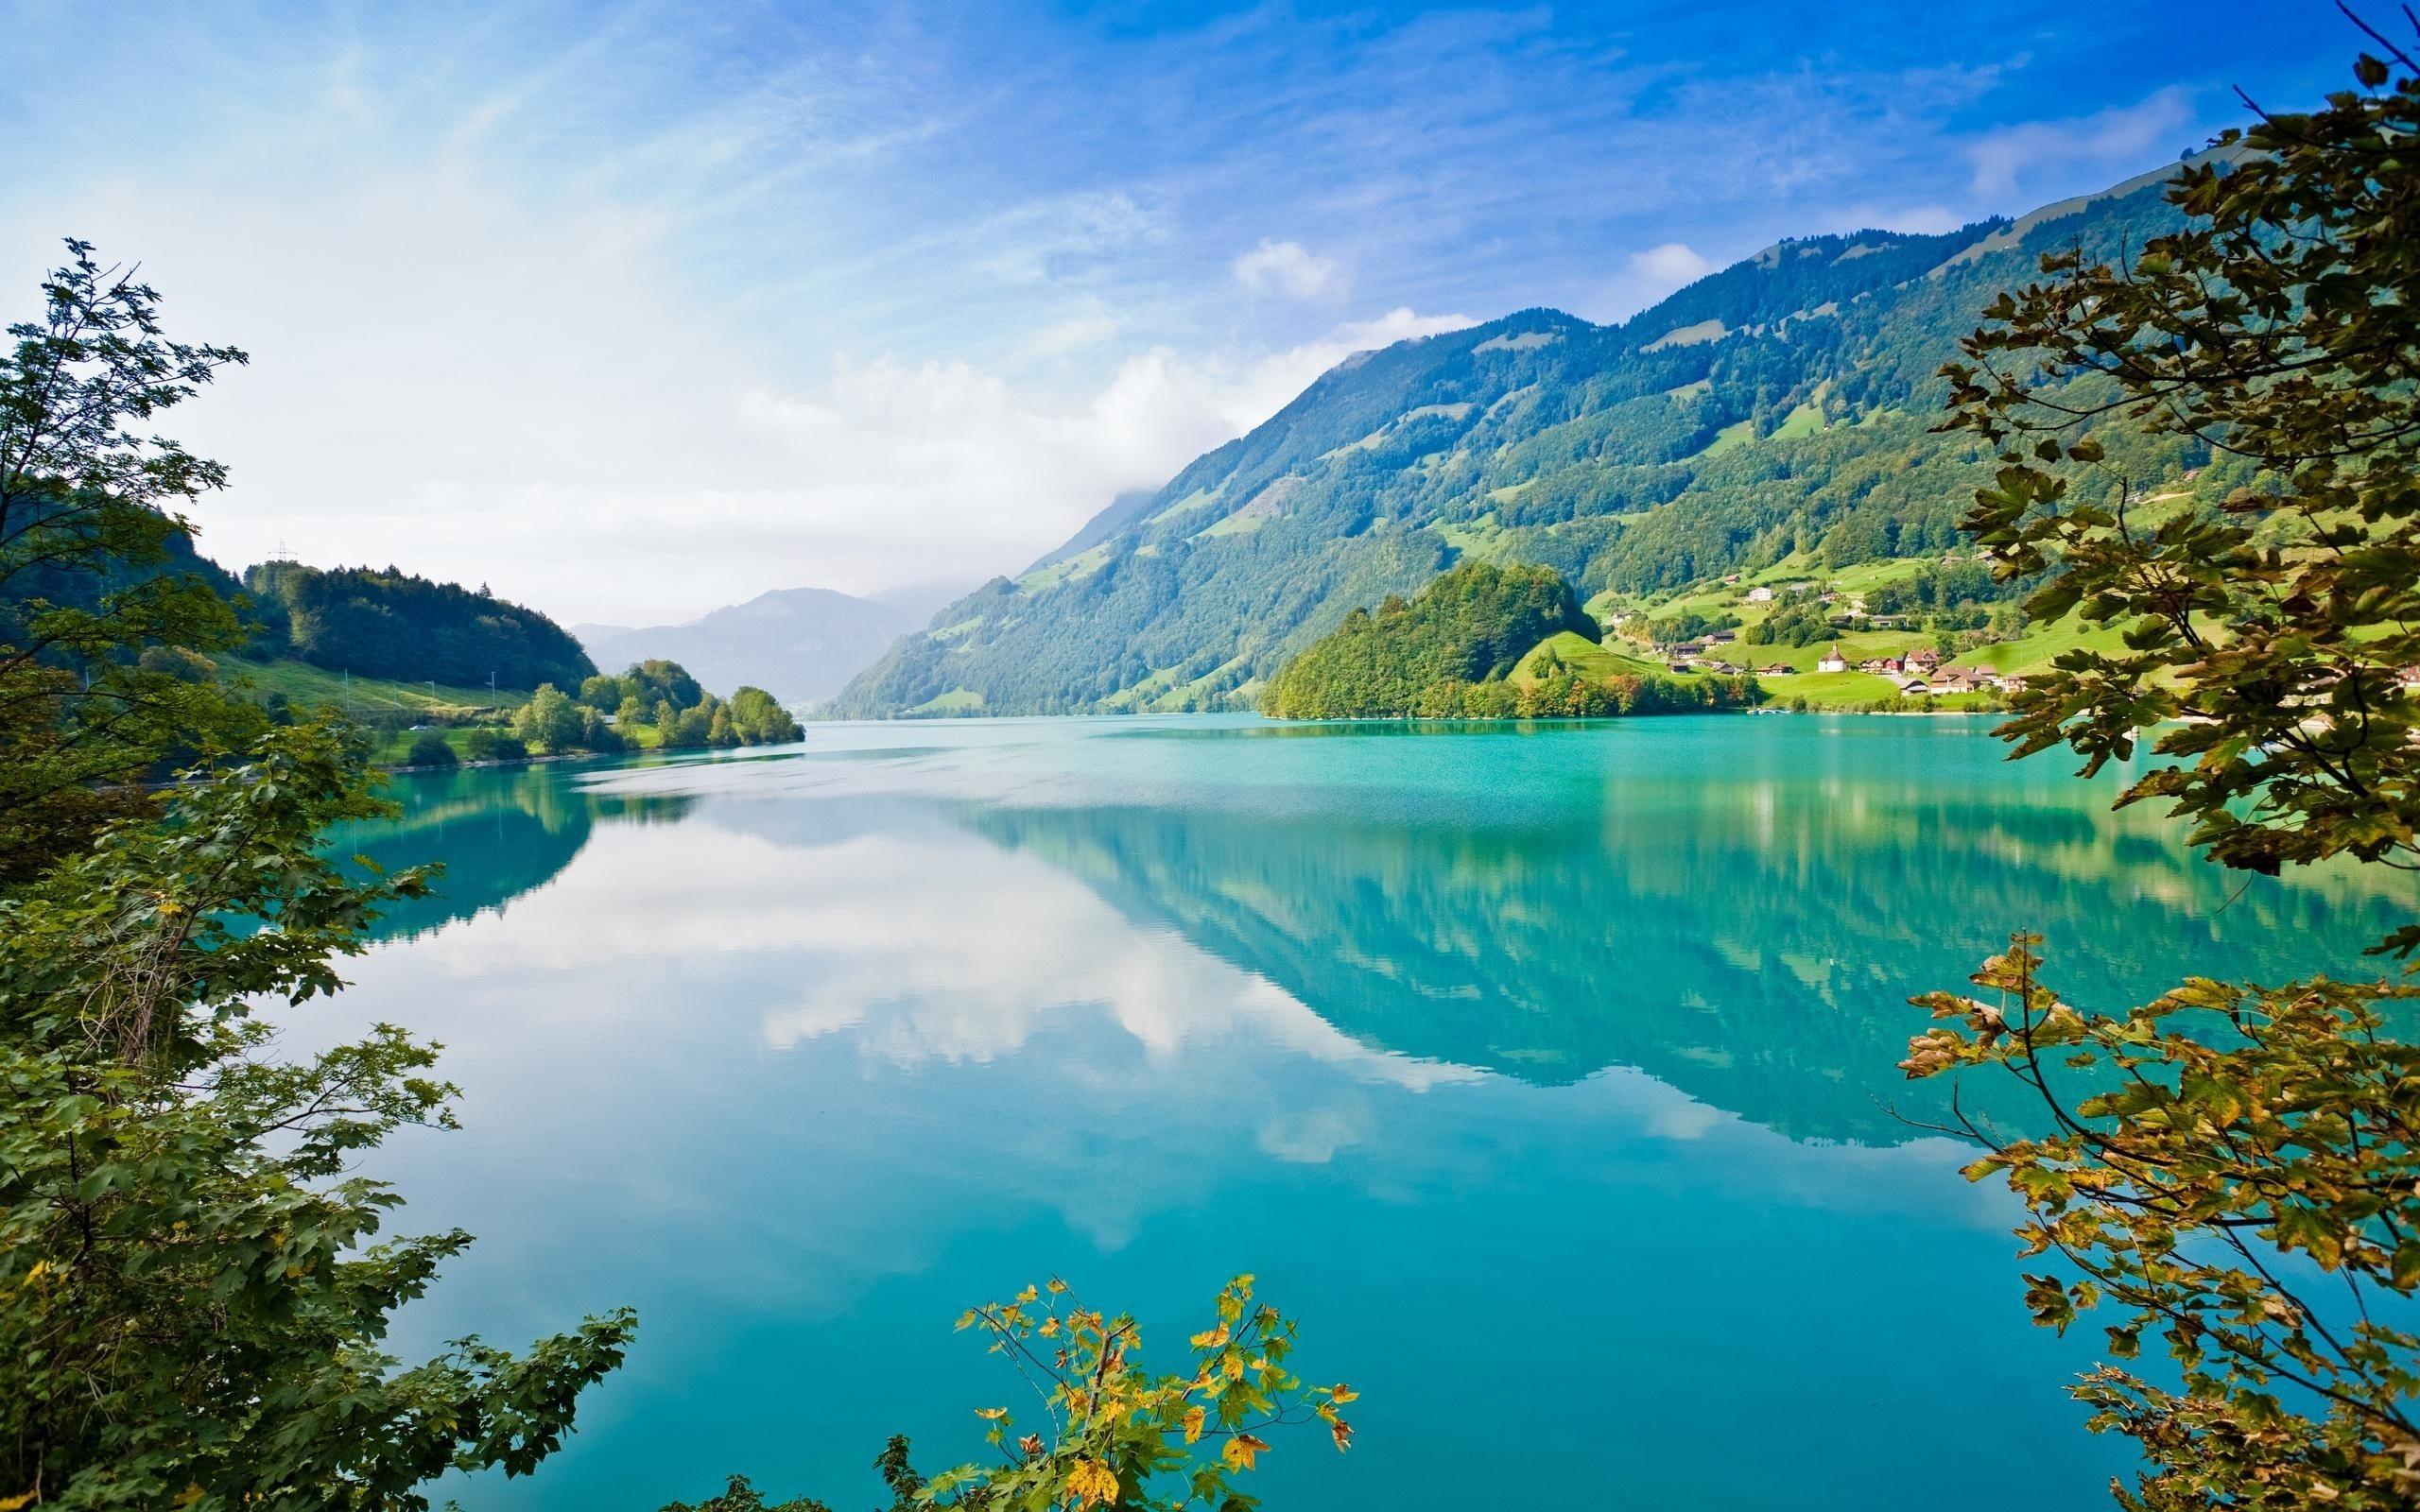 Res: 2560x1600, Beautiful Landscape Wallpaper 1080p On HD Wallpaper